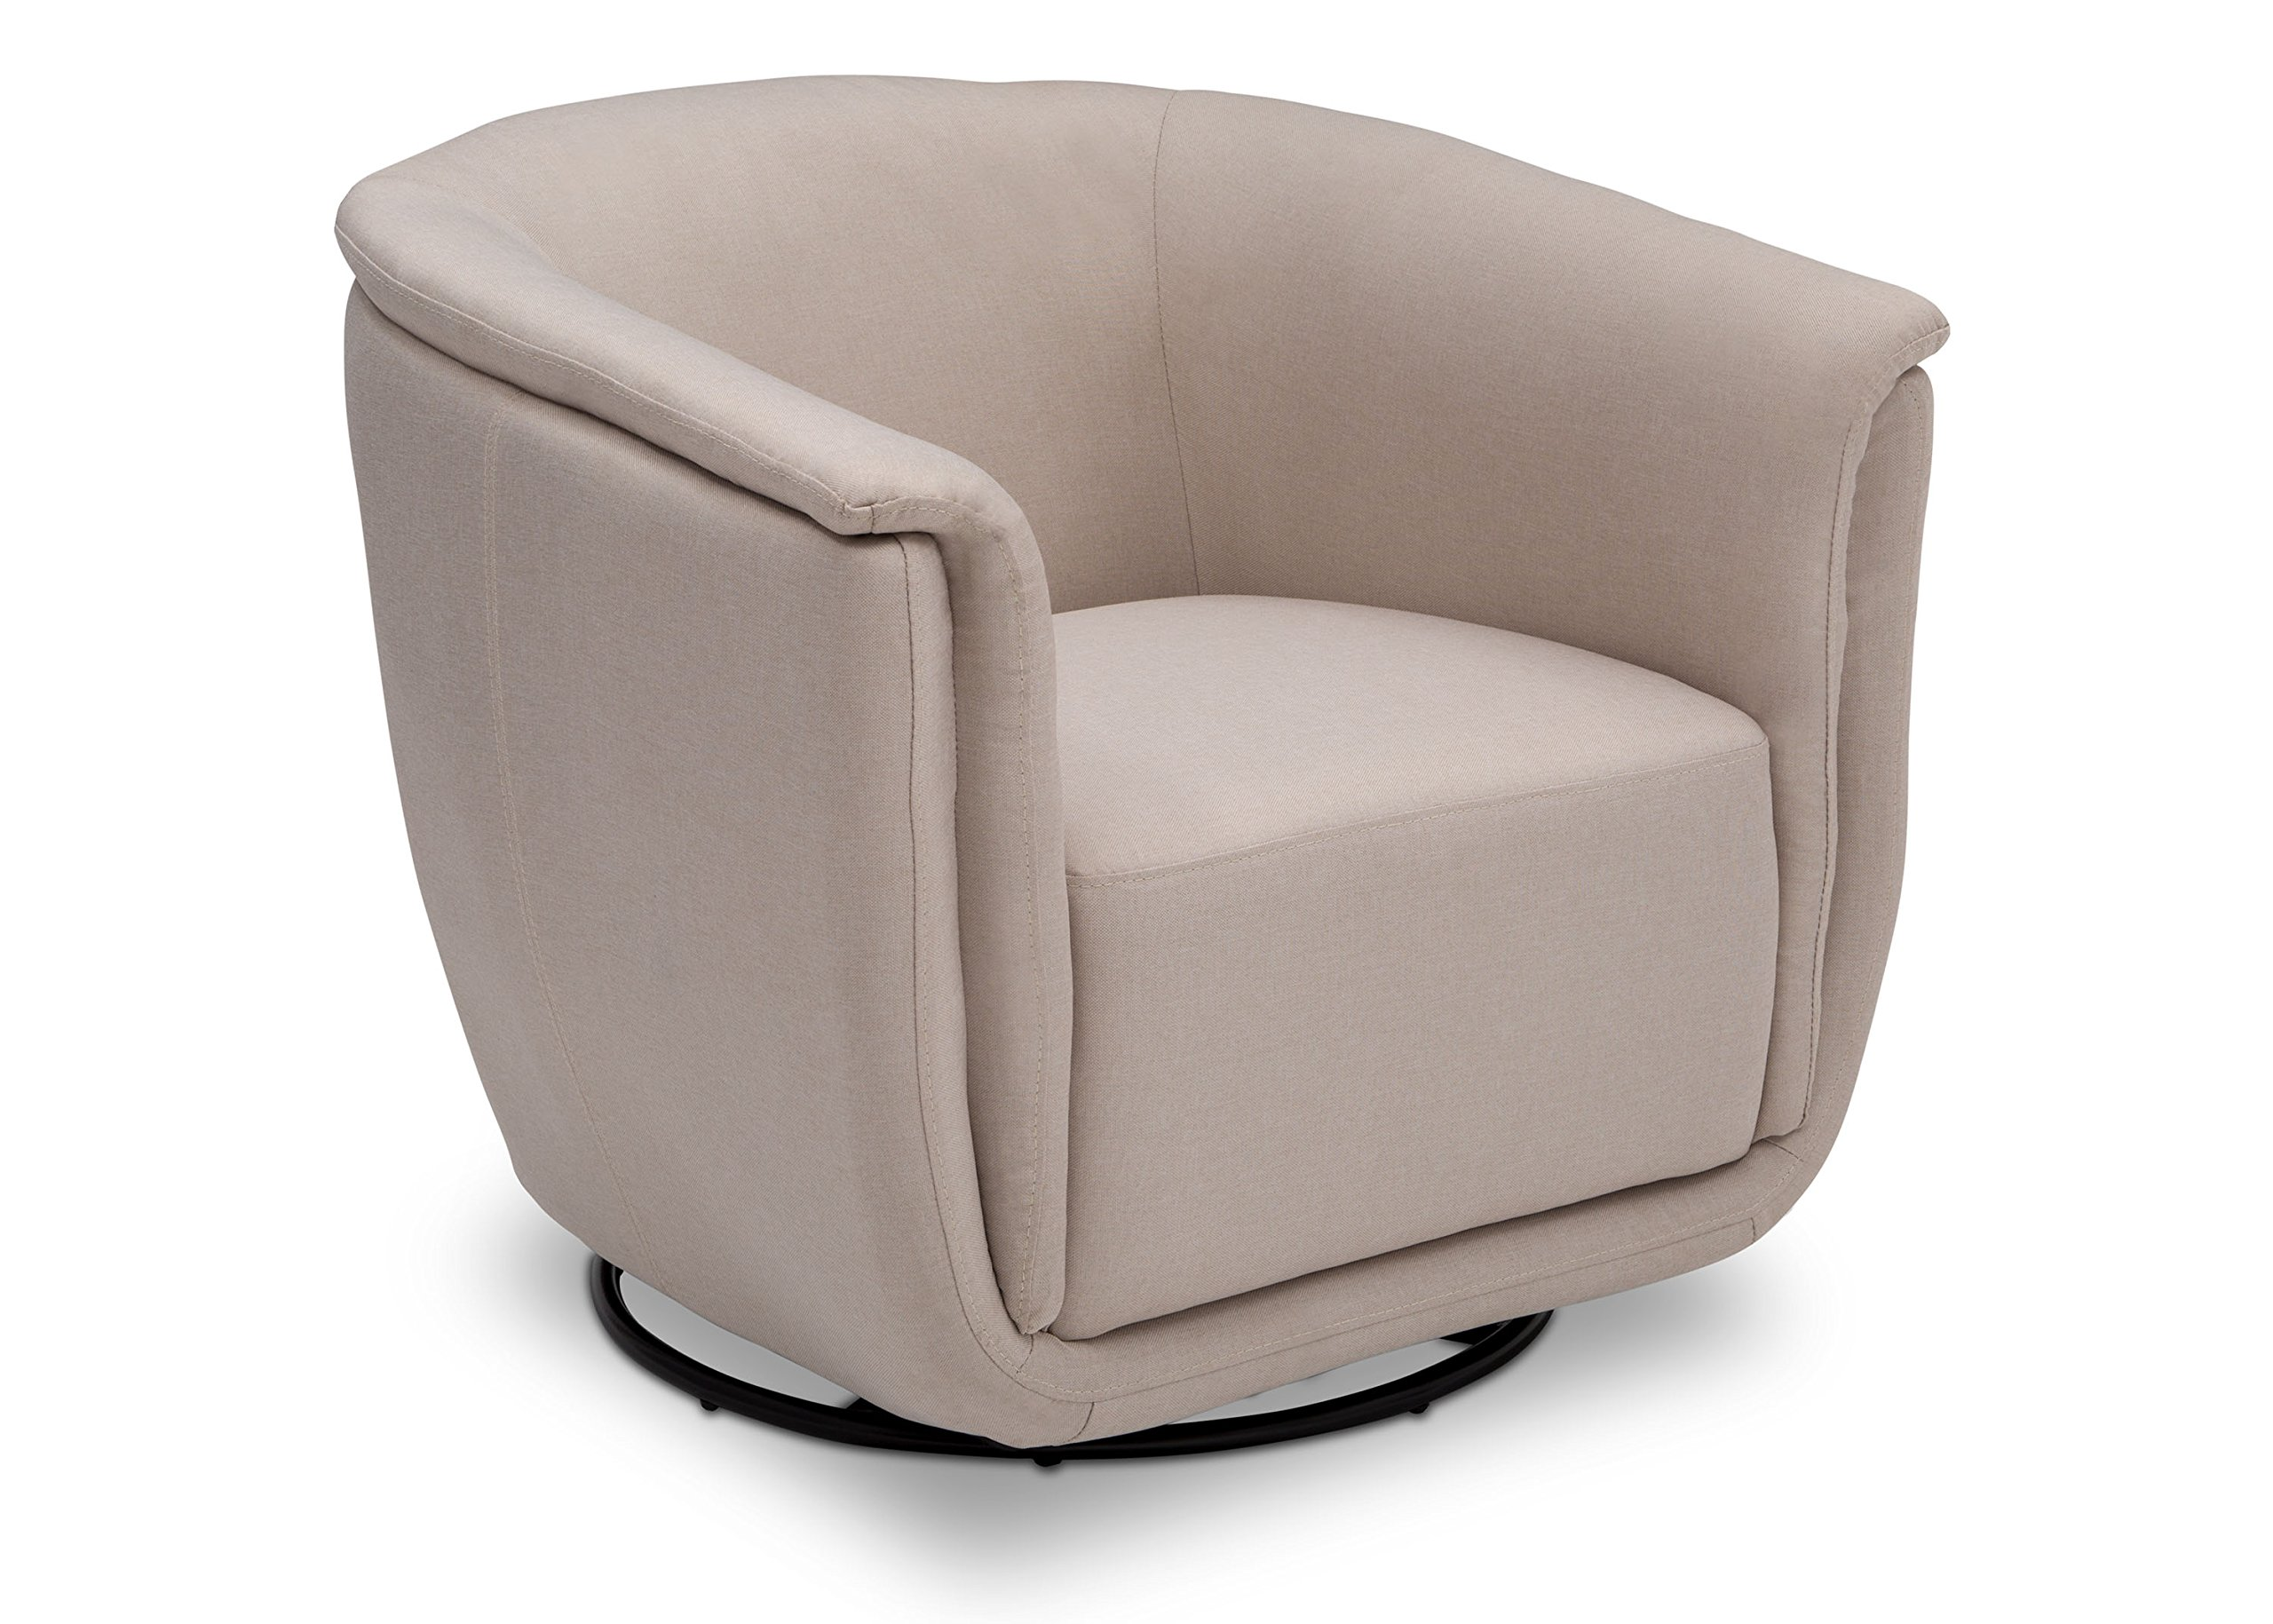 Delta Children Skylar Nursery Glider Swivel Rocker Tub Chair, Flax